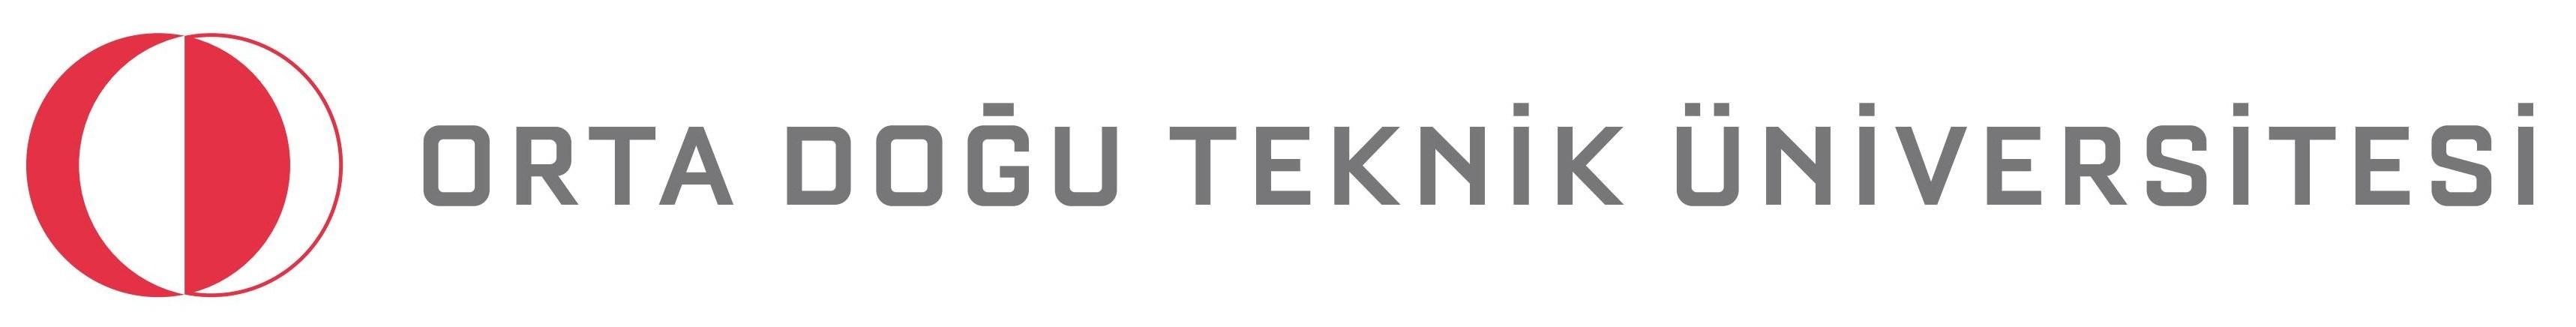 ODTU_Orta_Dogu_Teknik_Üniversitesi_Logo